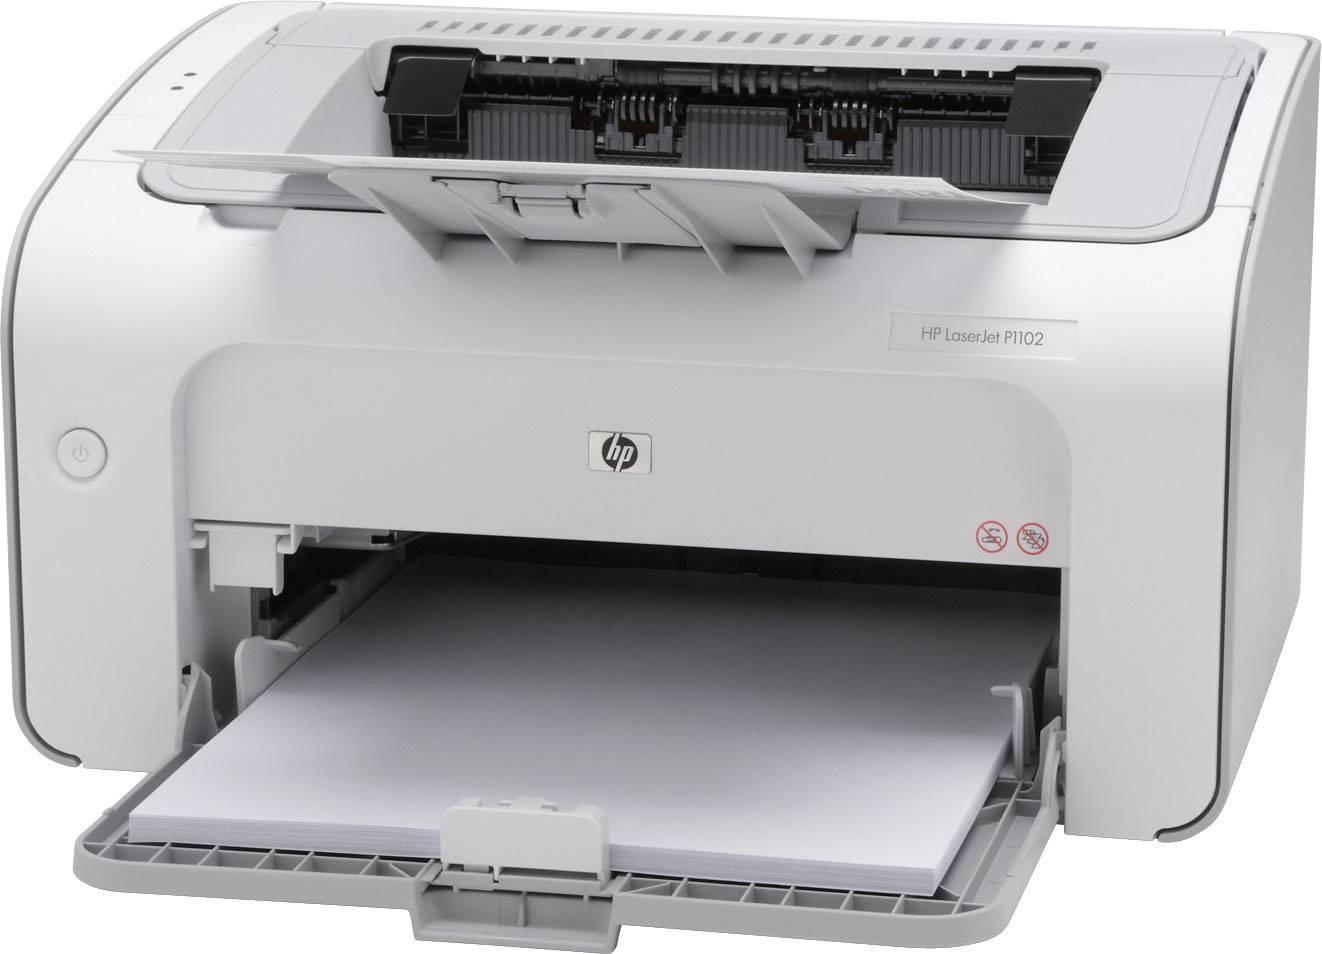 hp laserjet p1102 monochrome laser printer a4 600 x 600 dpi from rh conrad com HP LaserJet P1102w Troubleshooting HP LaserJet P1102w Wireless Setup